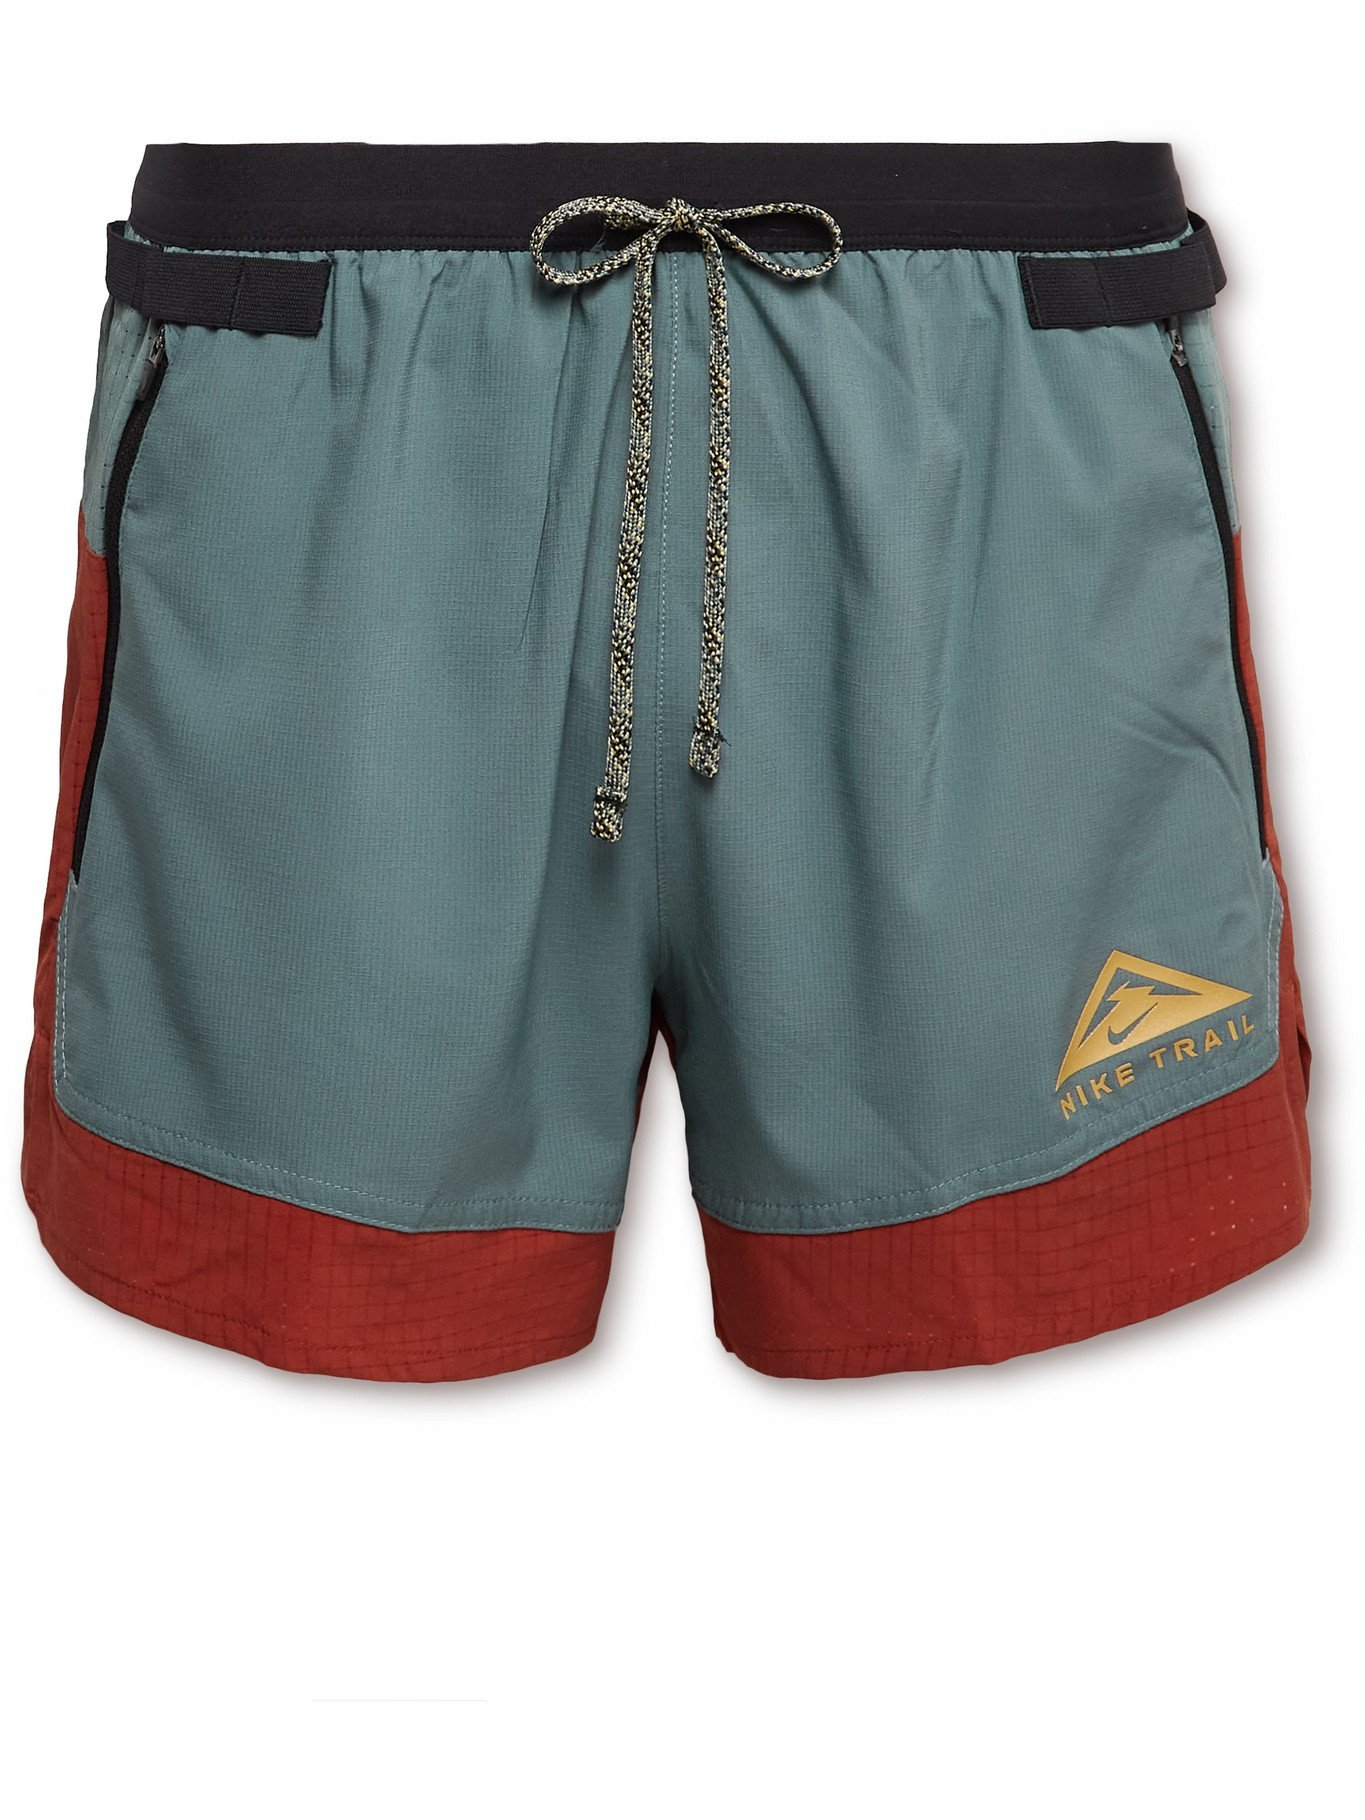 NIKE RUNNING - Flex Stride Dri-FIT Ripstop Shorts - Blue - M